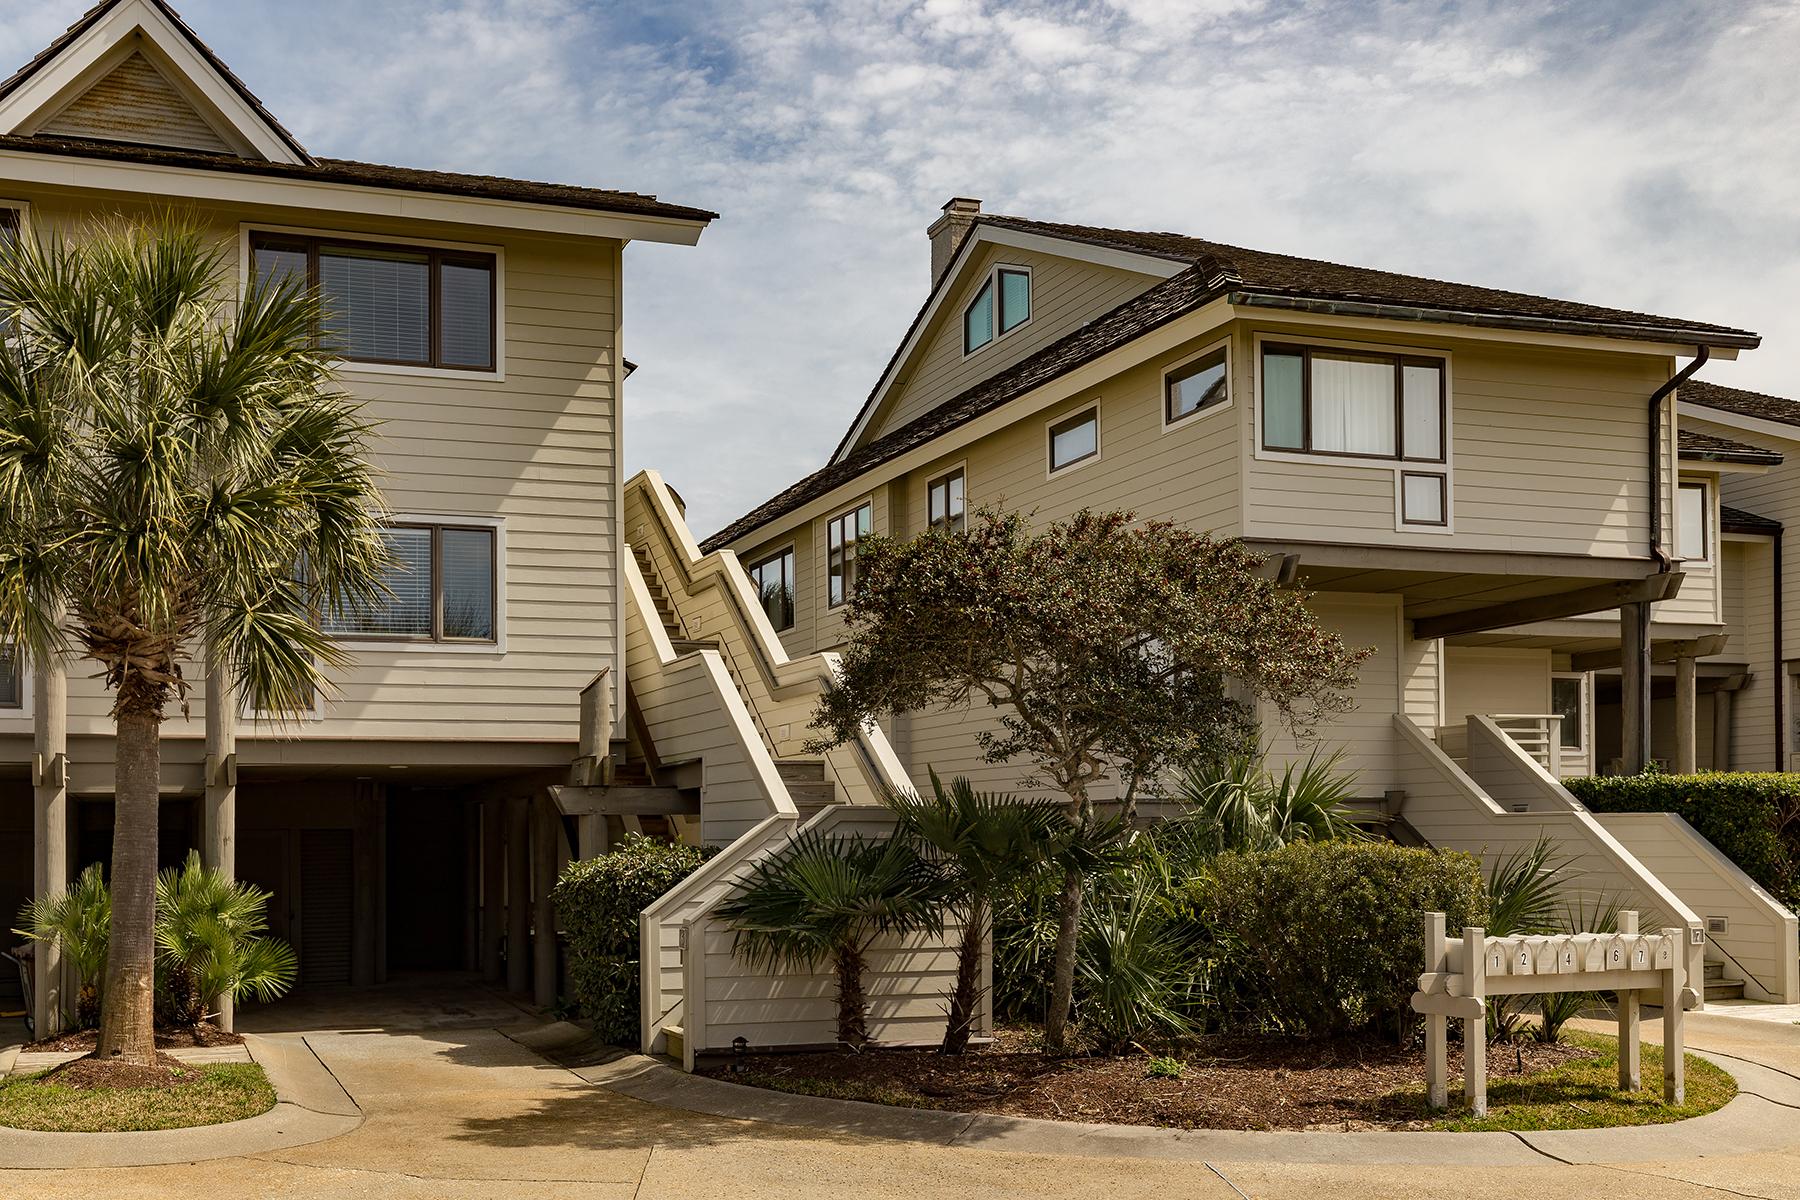 Condominio per Vendita alle ore 1059 Debordieu Blvd. 1059 DeBordieu Blvd Unit 5 Georgetown, Carolina Del Sud, 29440 Stati Uniti